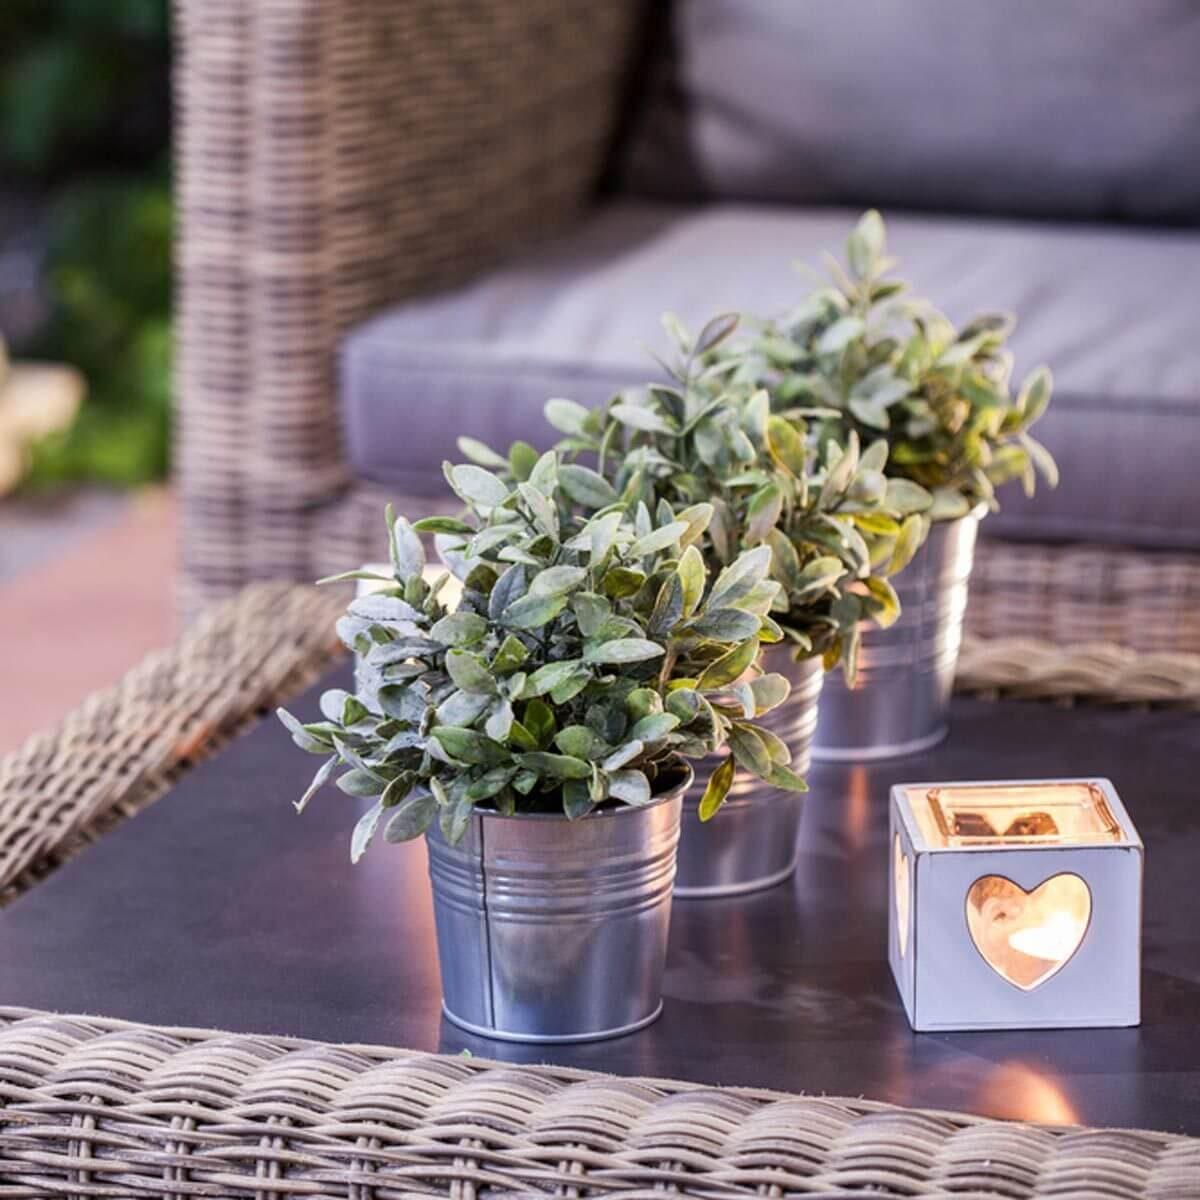 patio furniture accessories plants